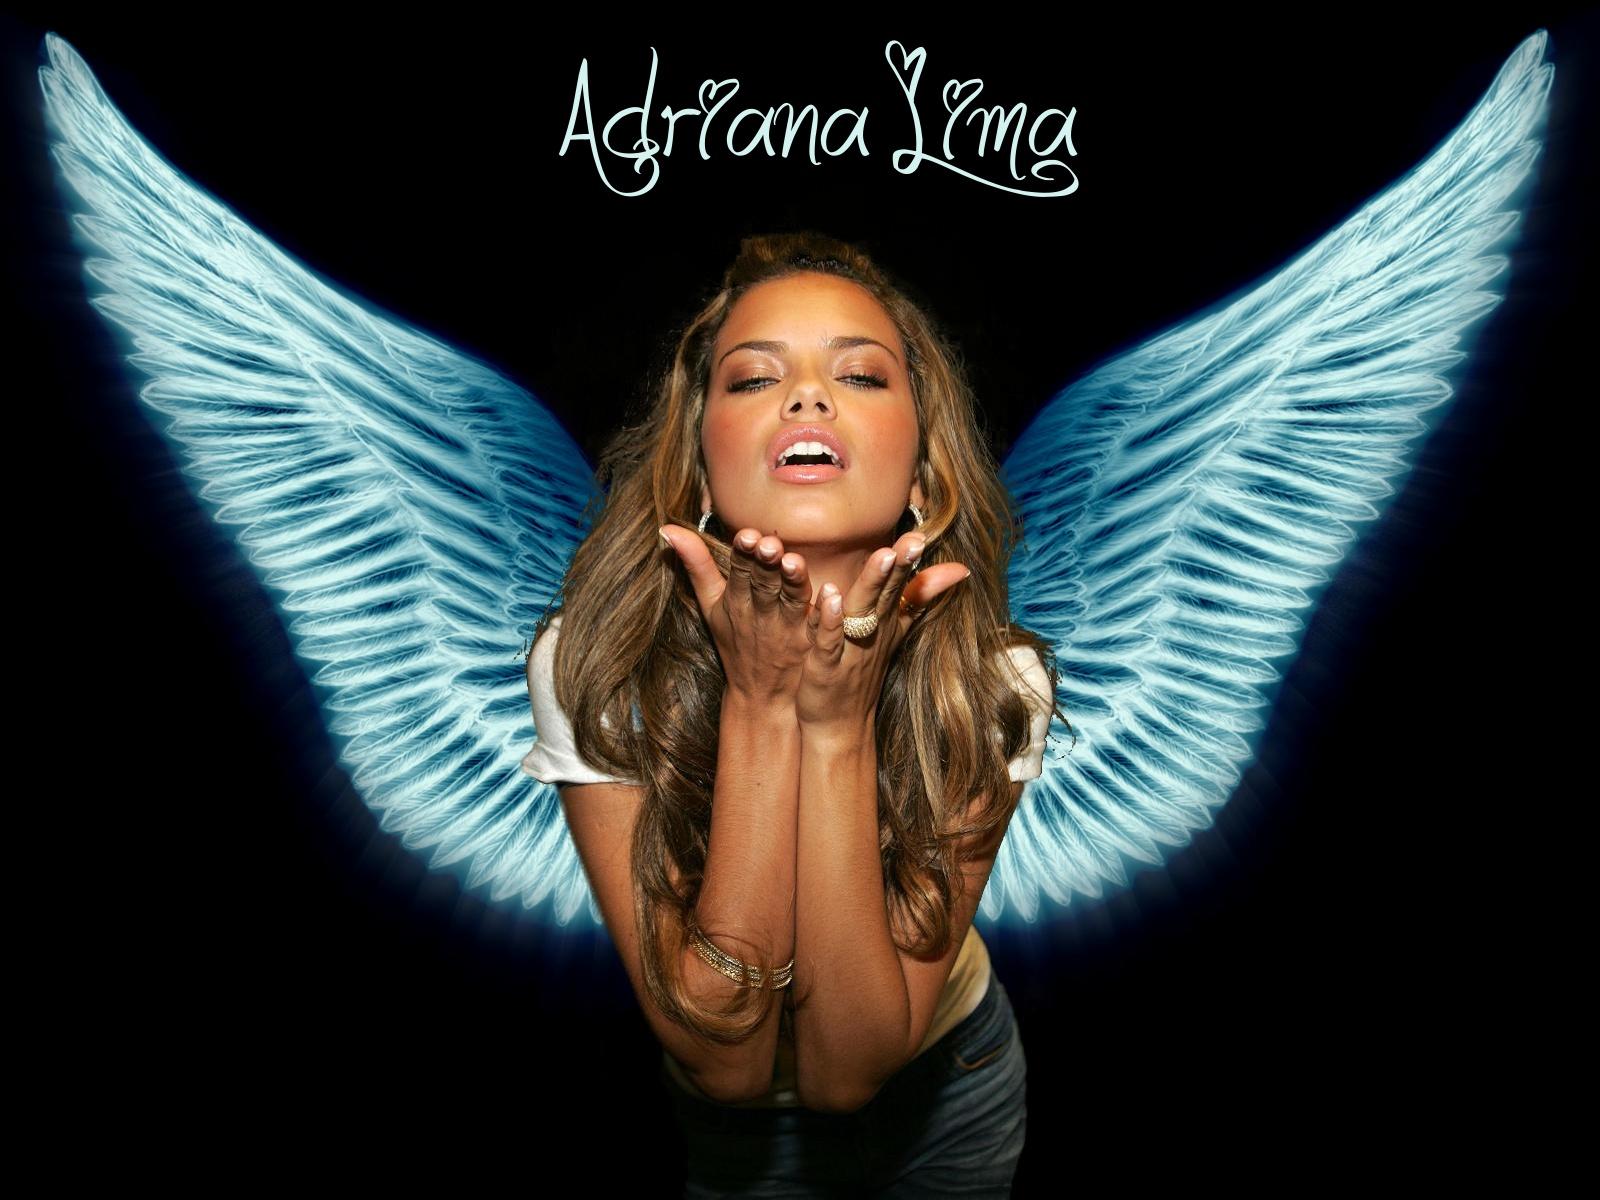 Angel Lima adriana lima is an angelcortexd on deviantart